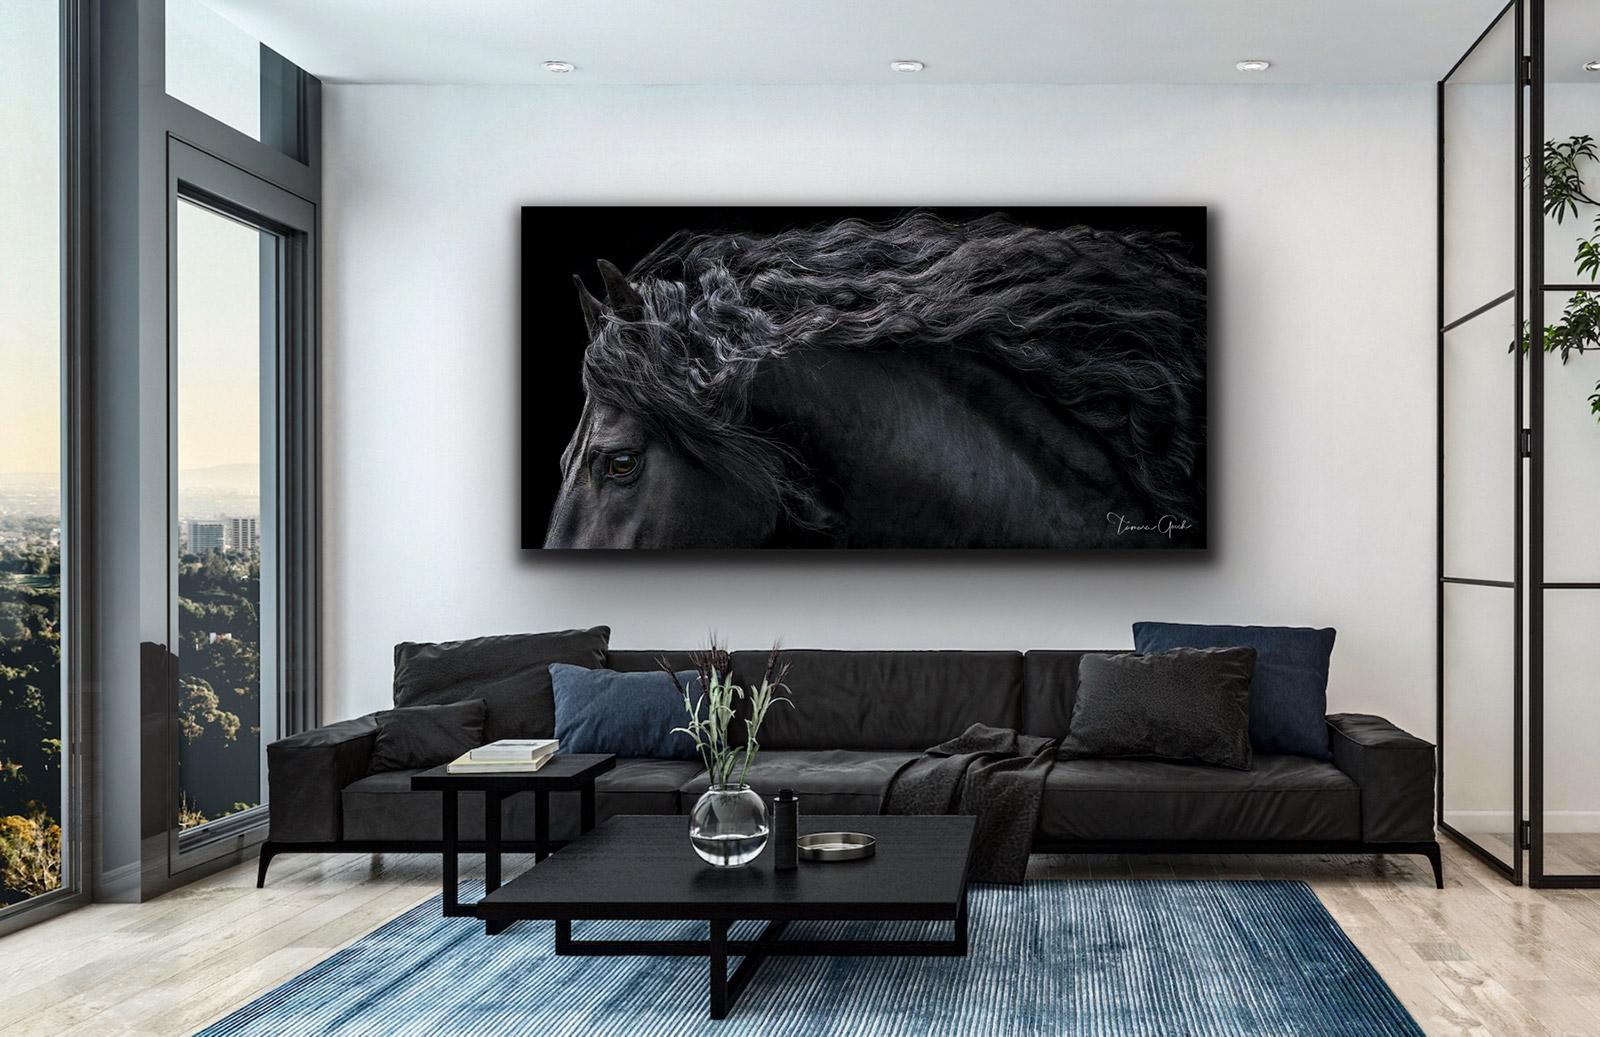 Friesian, horse, equine, cheval, caballos, print, photo, photography, art, wall, equestrian, baroque, panorama, metal, aluminum, tru-life acrylic, interior, design, home, office, decor, limited editio, photo